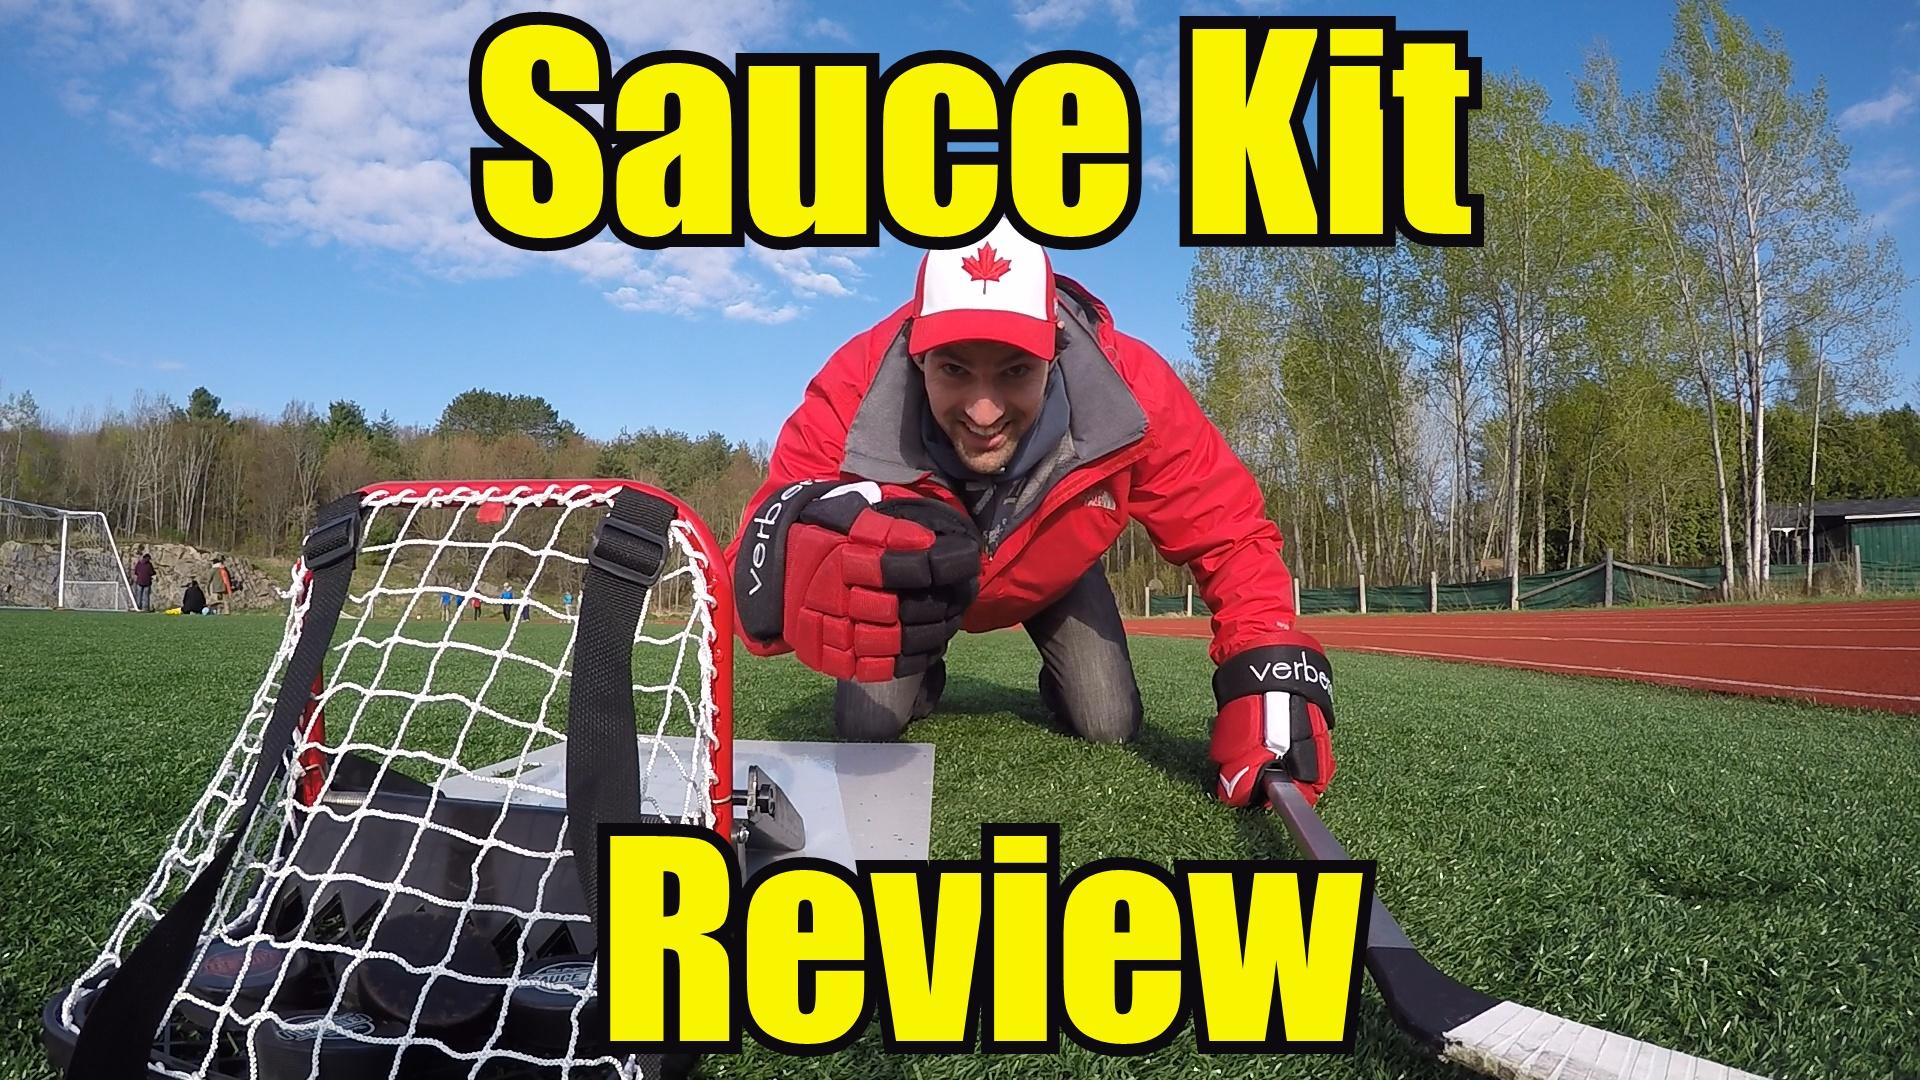 Hockey Sauce Kit Review